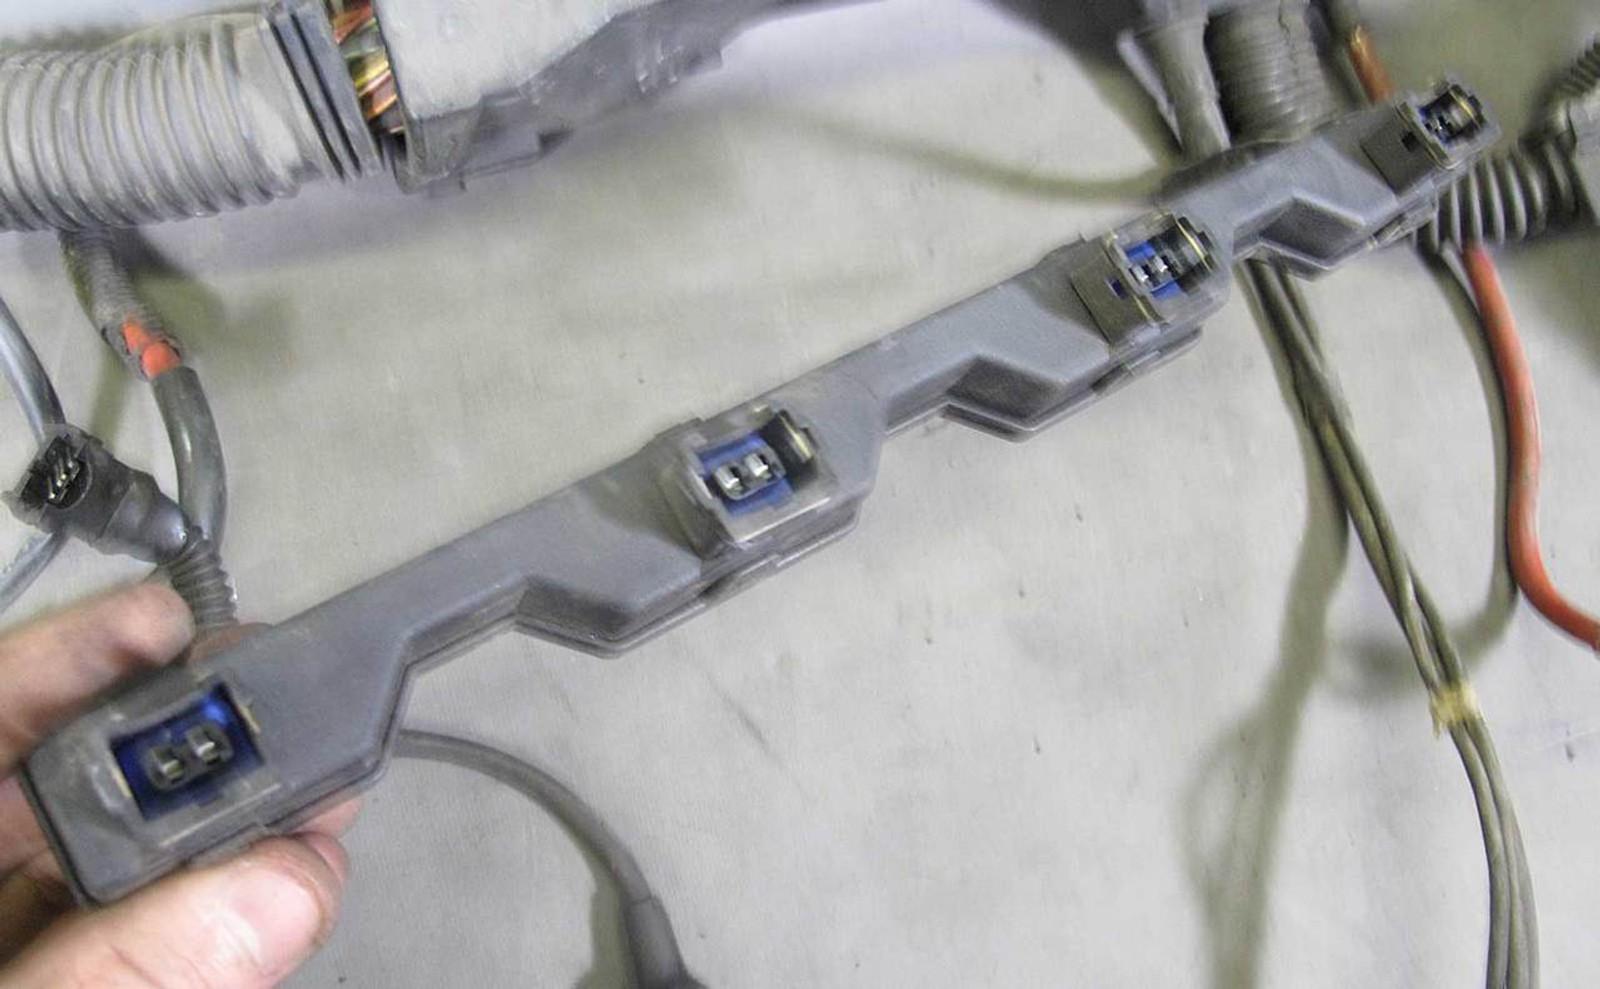 1995 bmw e36 318i m42 4 cylinder engine wiring harness complete for bmw radio wiring diagram 1995 bmw wiring harness #19